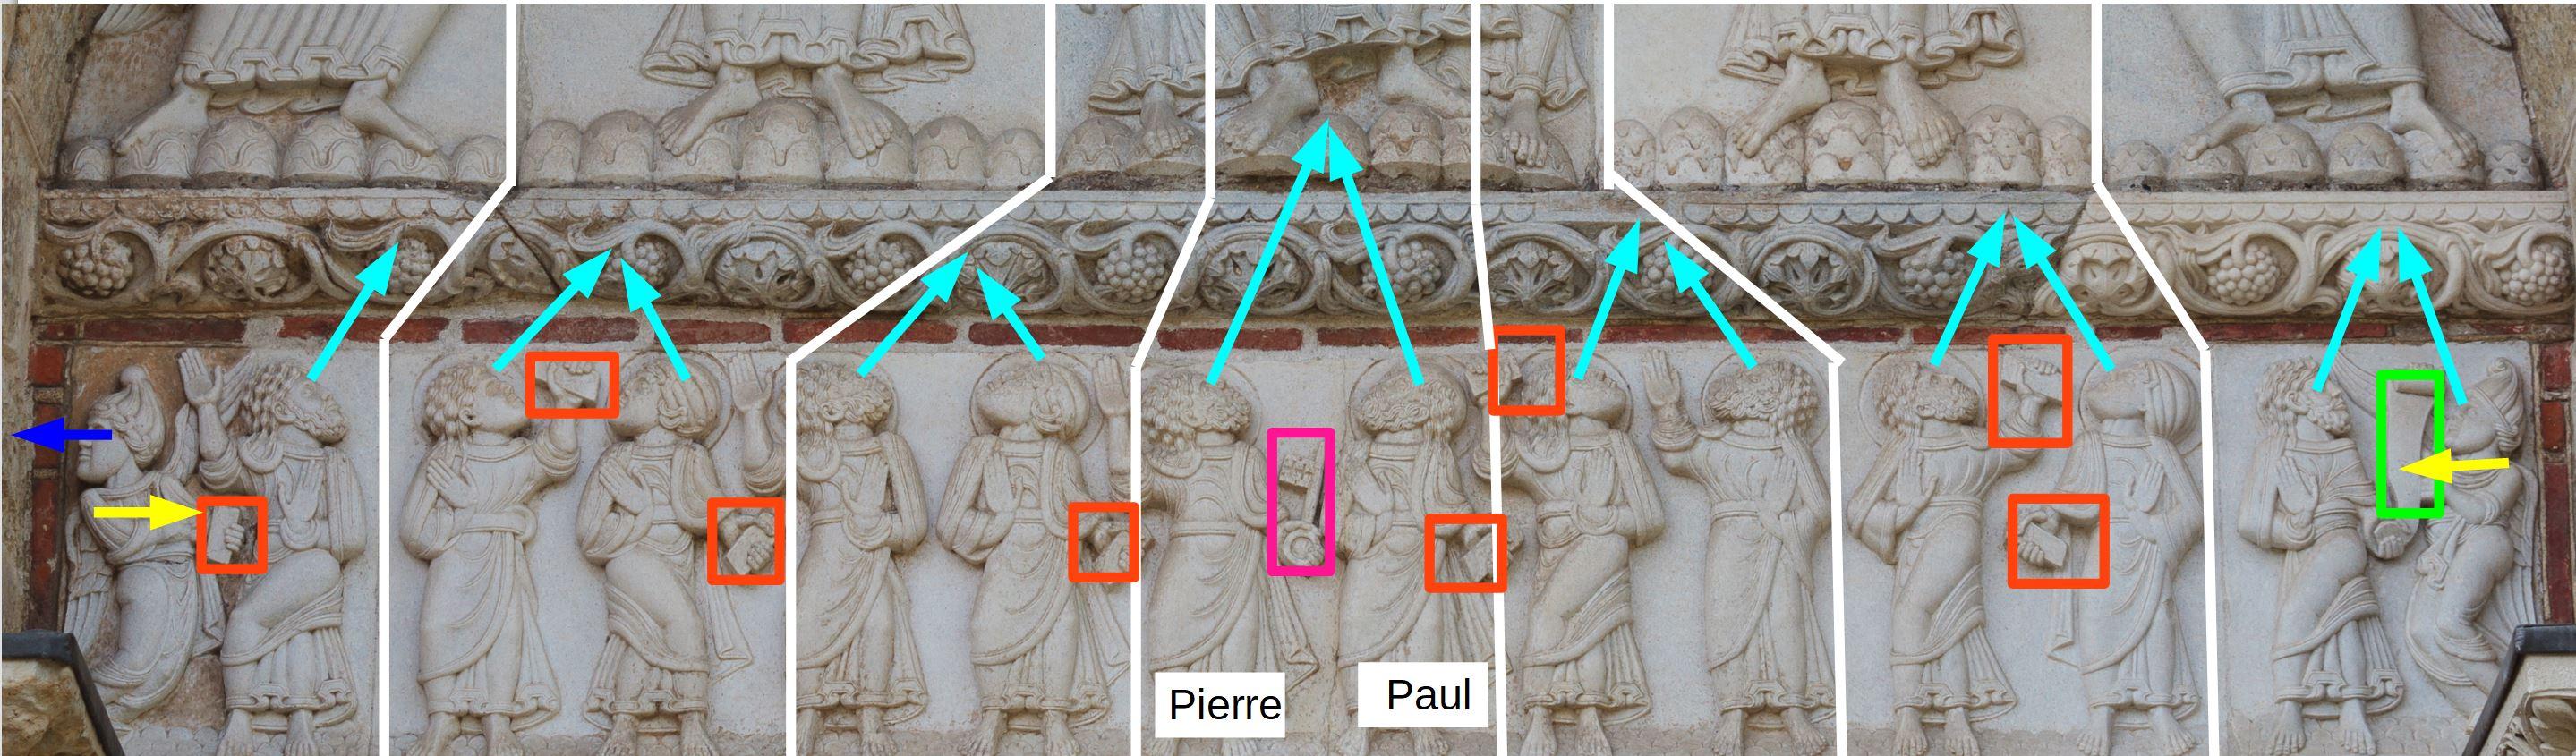 Porte_Miegeville_-_Basilique_Saint-Sernin schema 3